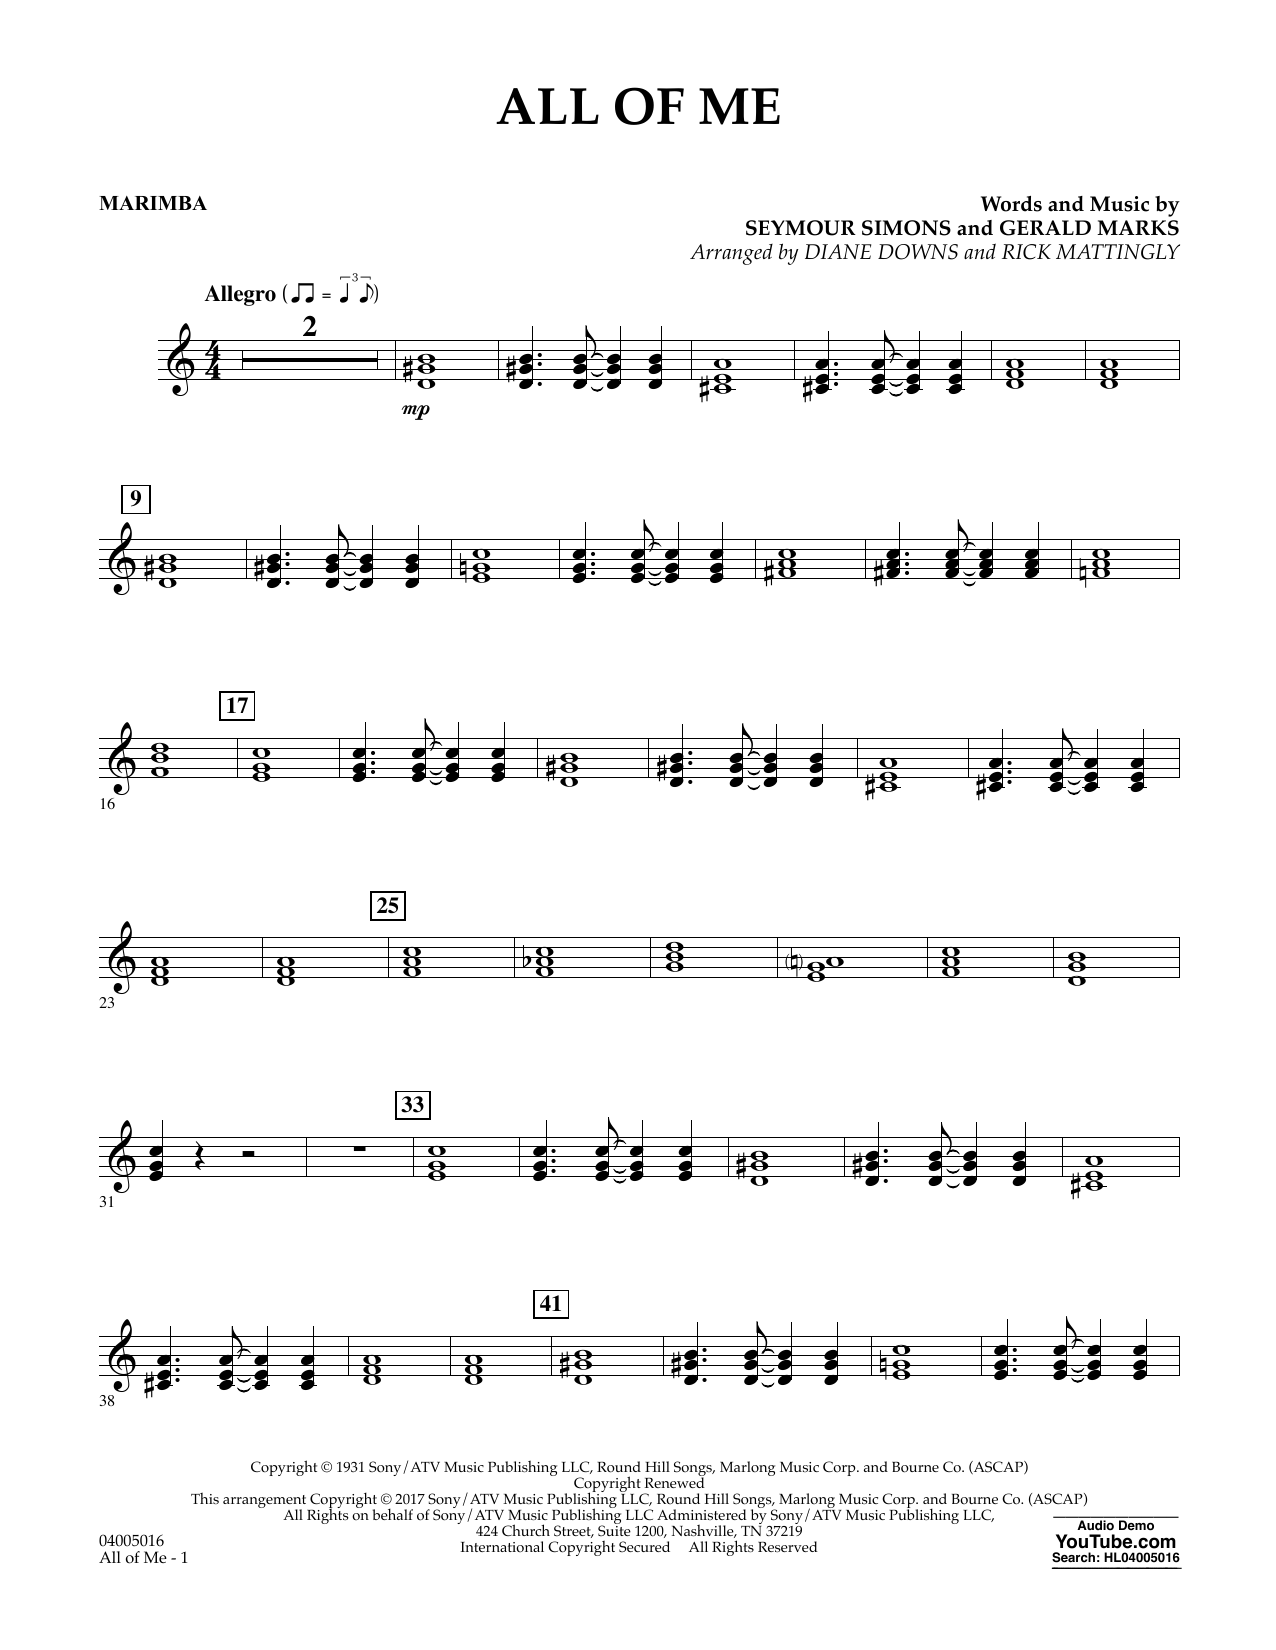 All of Me - Marimba Sheet Music